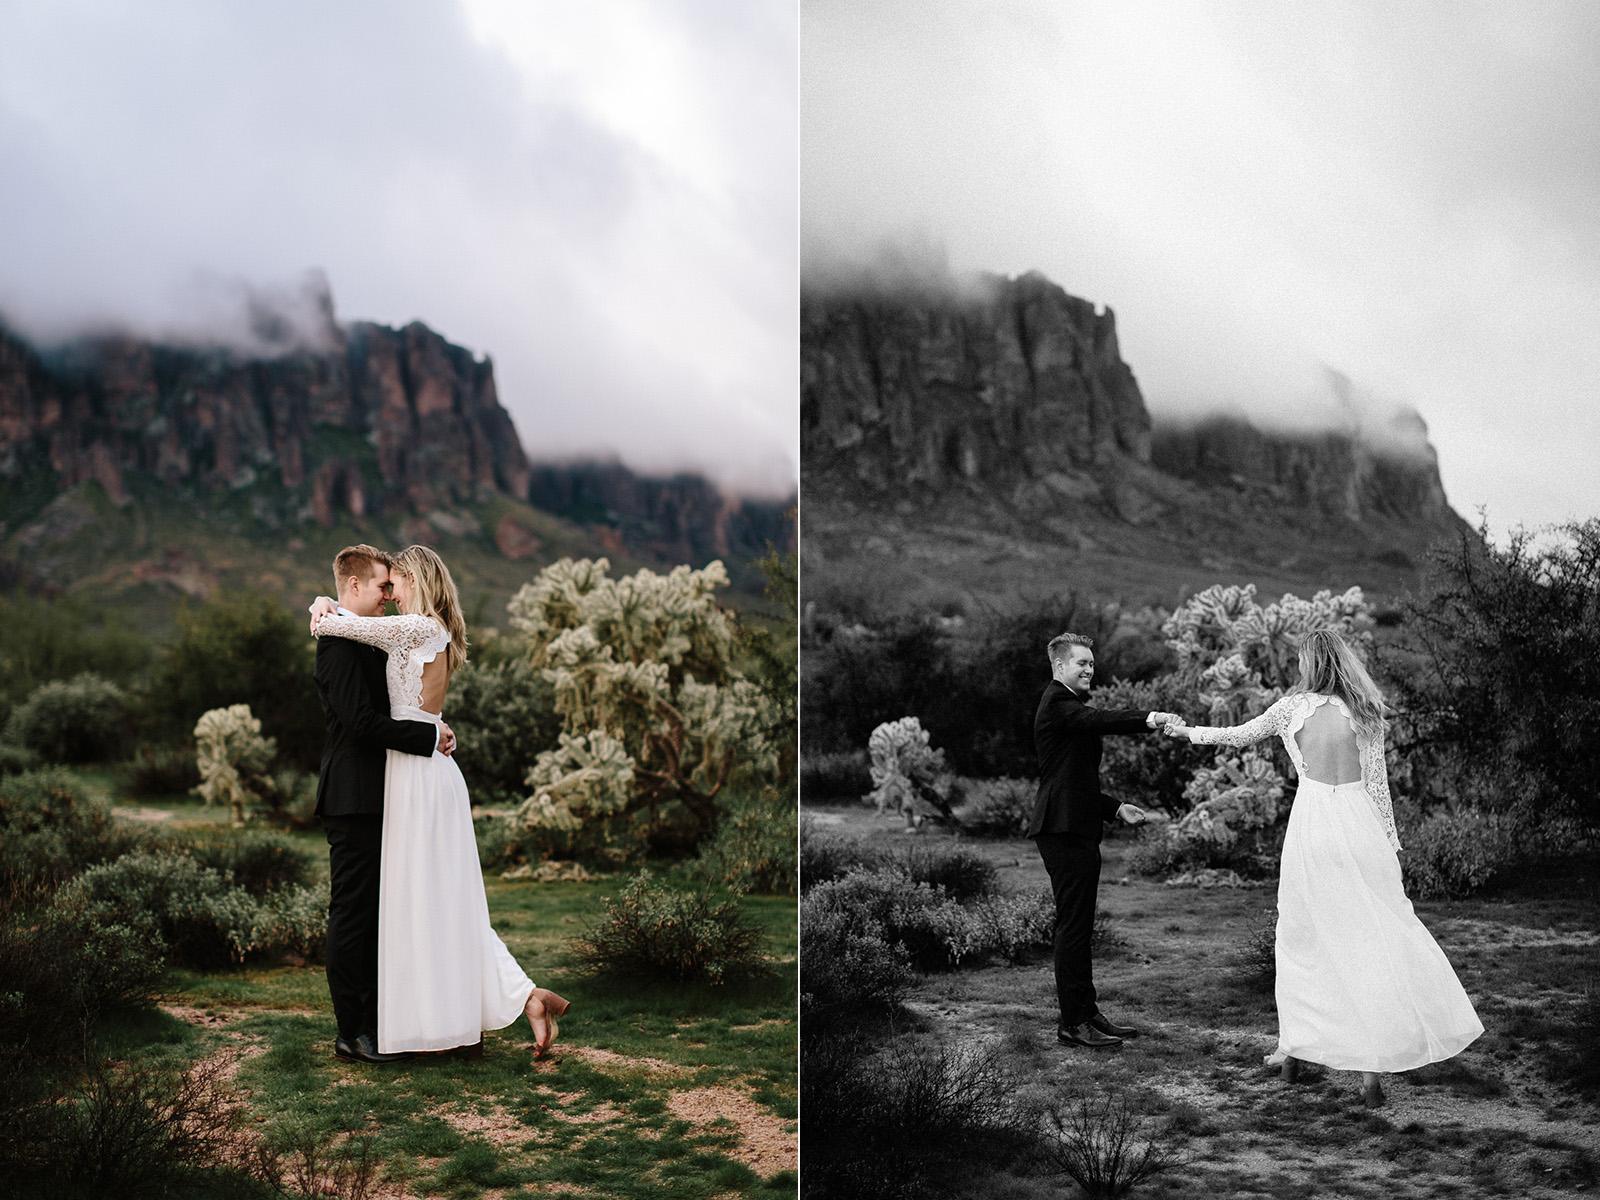 phoenix-mesa-elopement-wedding-photographer-lost-dutchman-state-park-superstitious-mountains-14.jpg